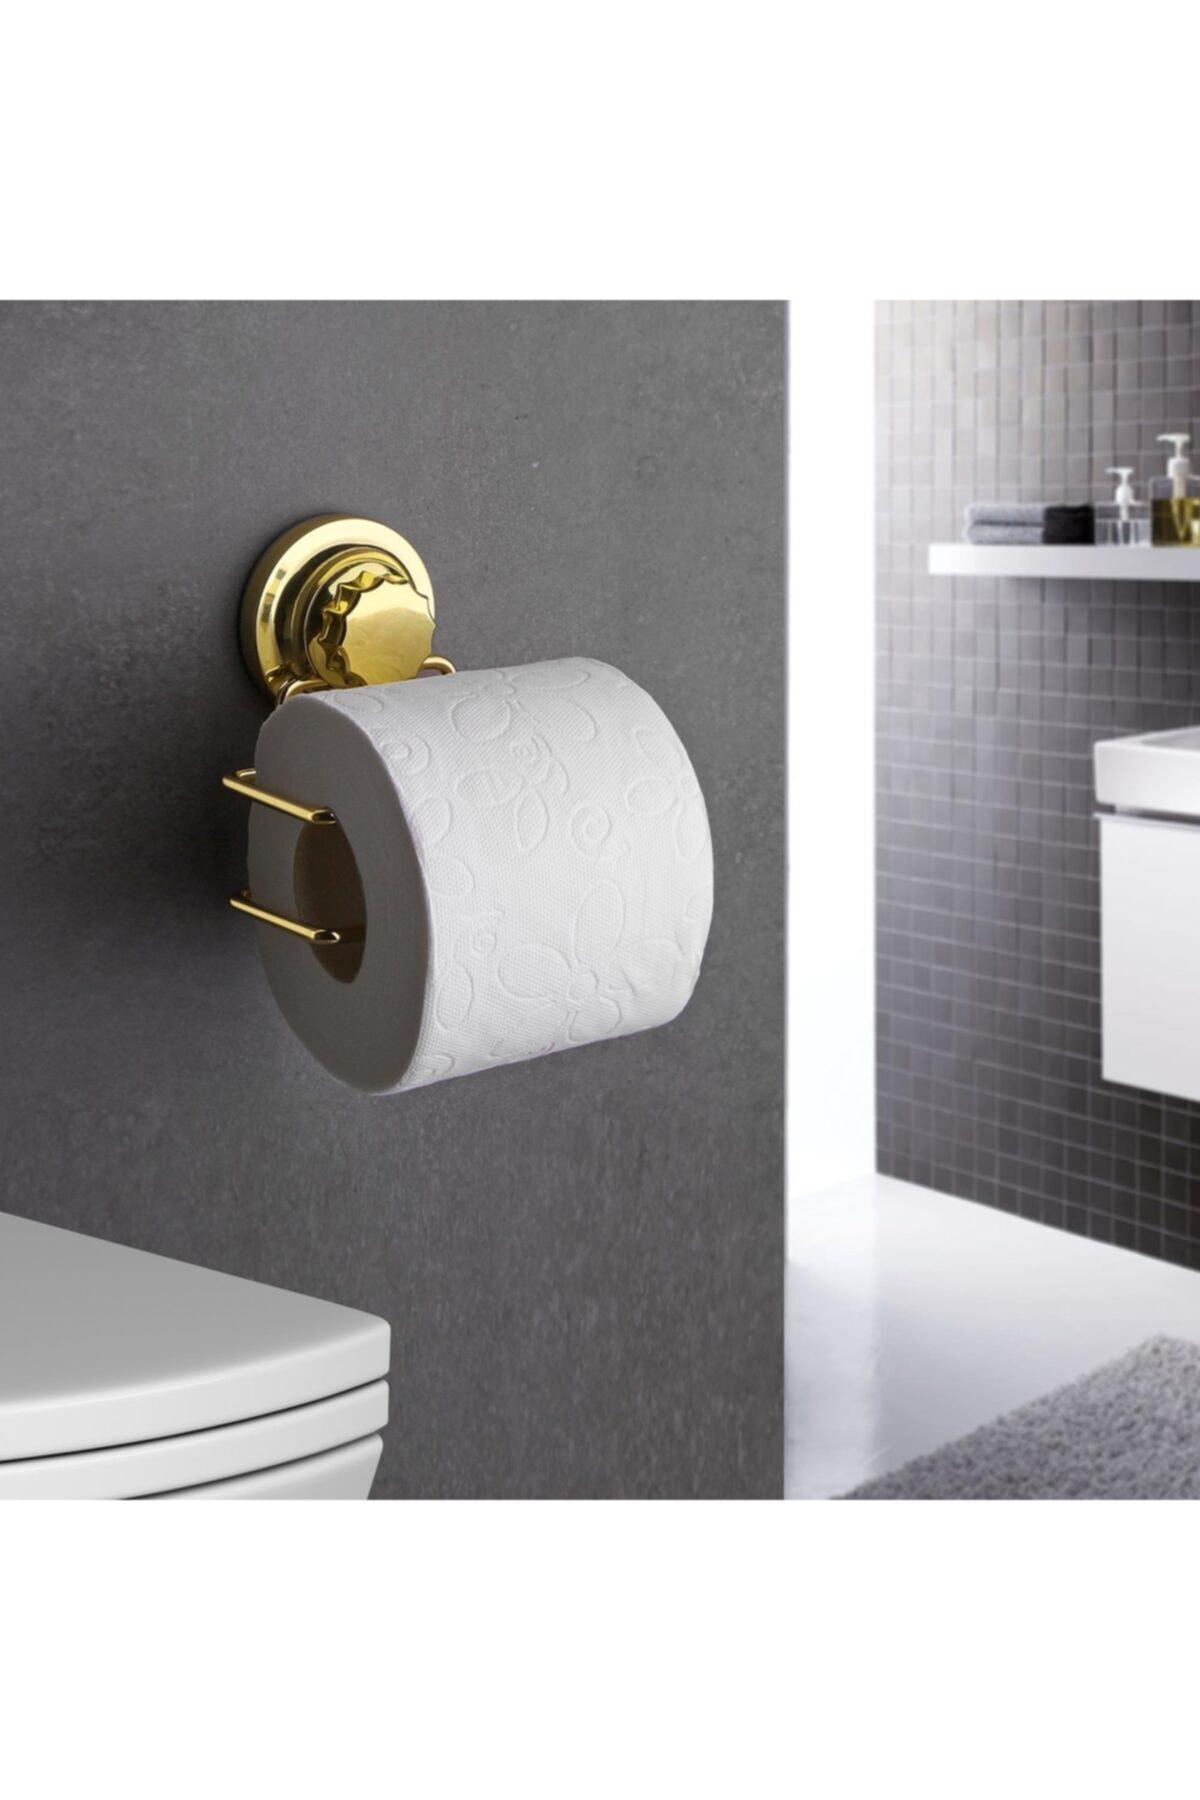 Gold Serisi Lux Wc Kağıtlık 3 Fonksiyonlu - Ister Vakumla, Ister Yapıştır, Ister Vidala